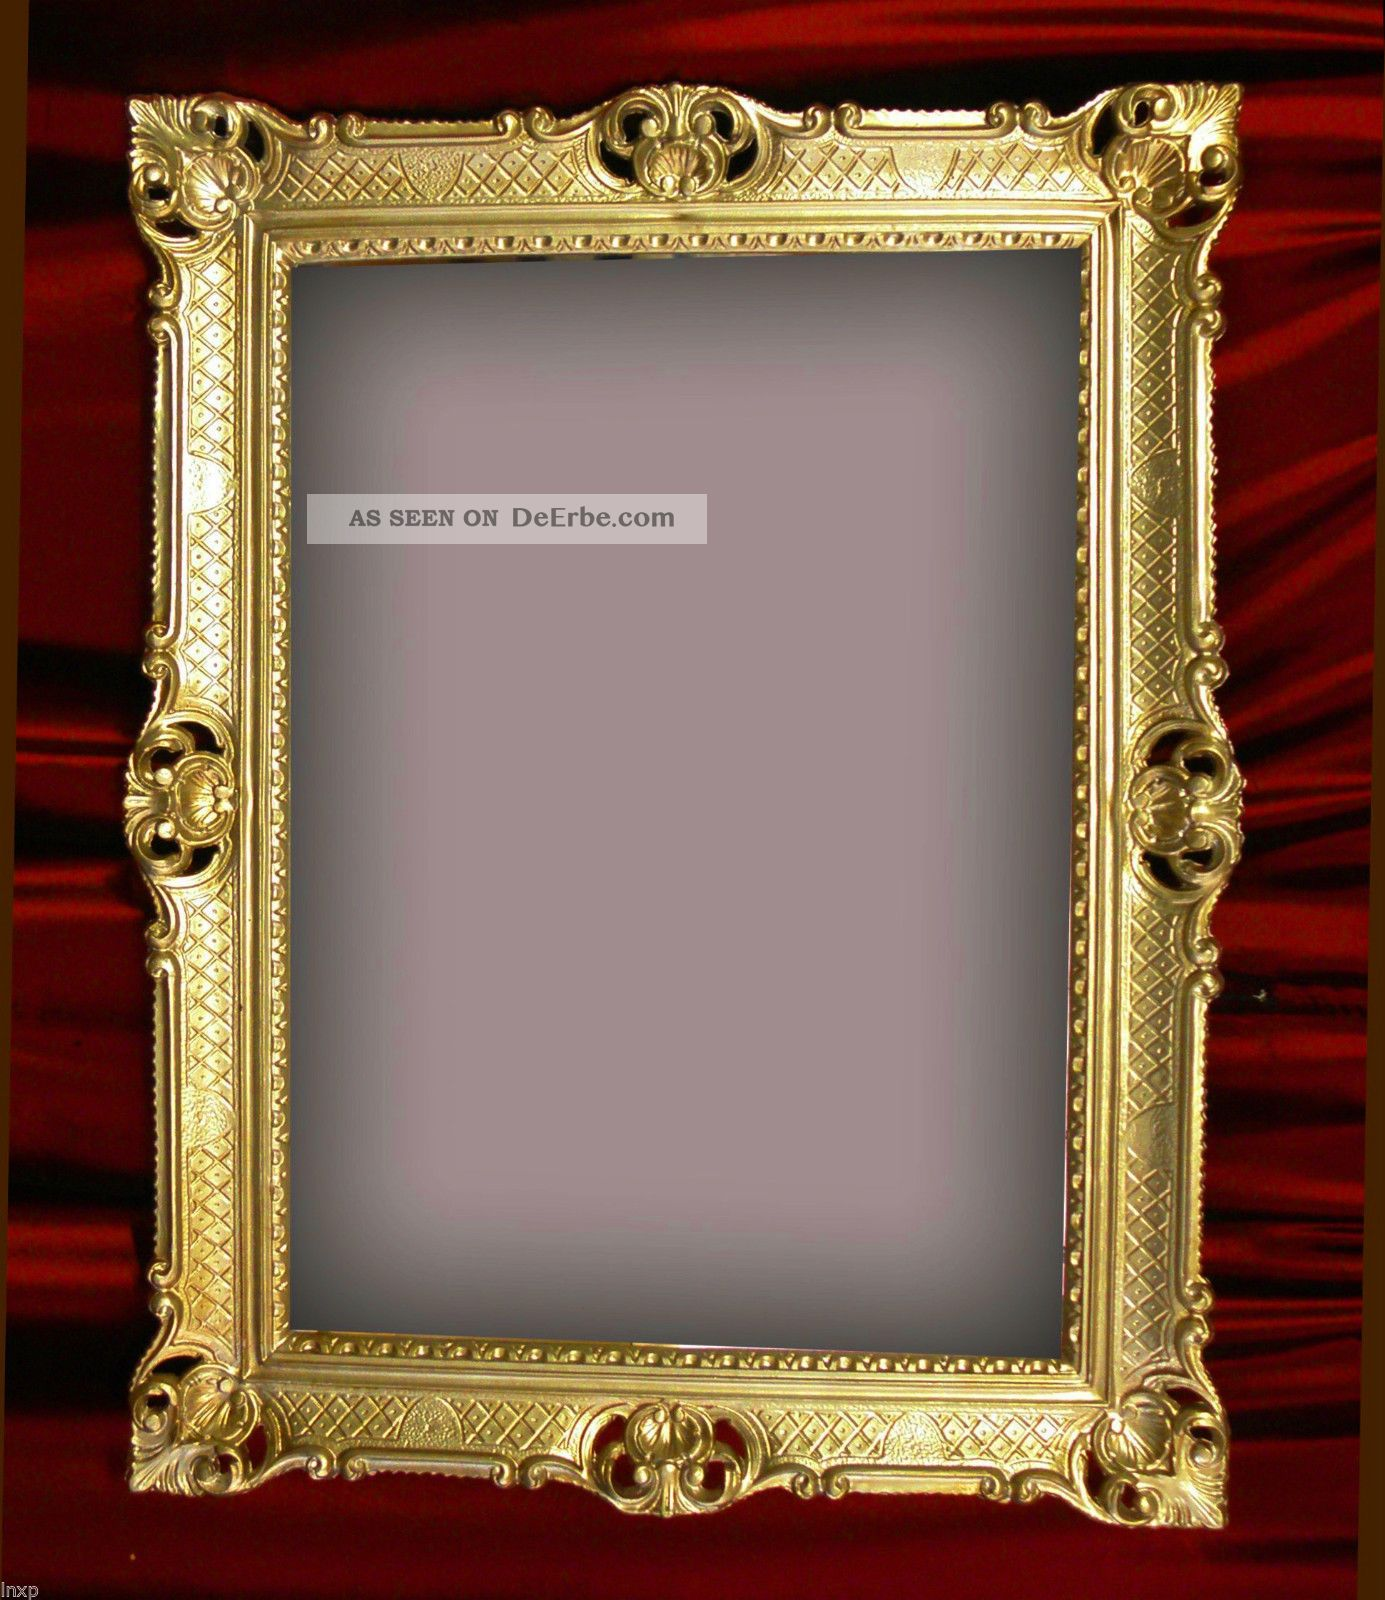 wandspiegel gold antik barock rokoko 90x70 cm wanddeko. Black Bedroom Furniture Sets. Home Design Ideas